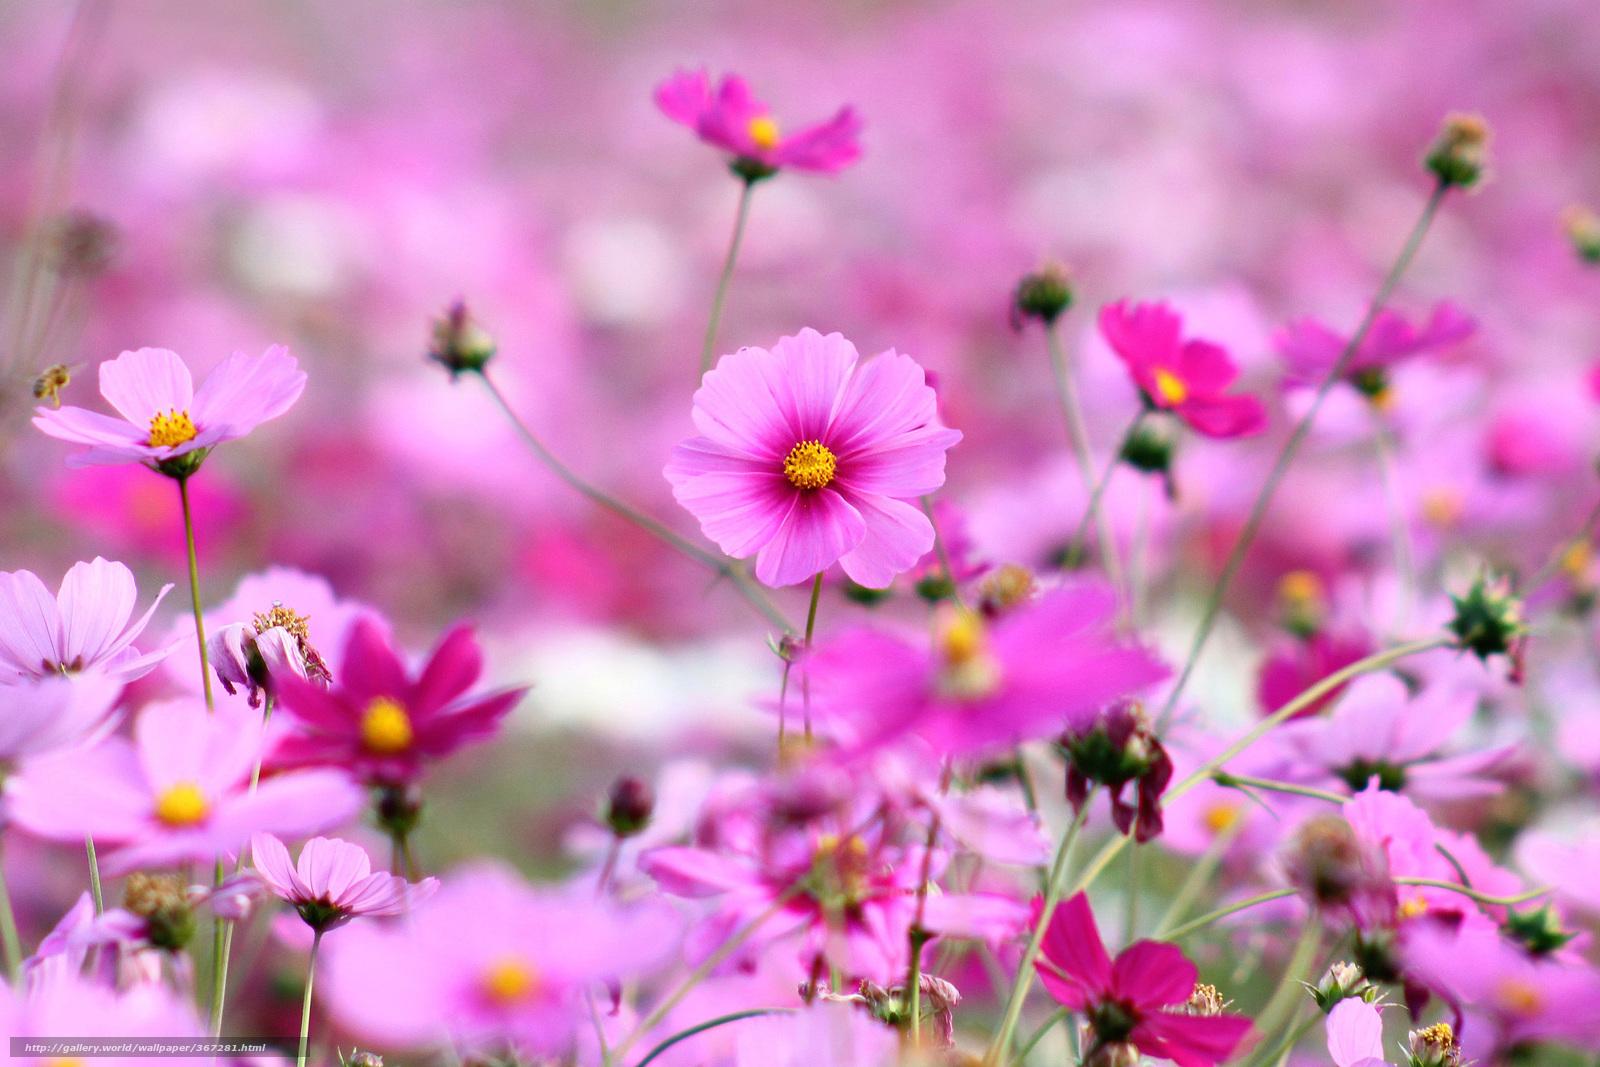 Scaricare gli sfondi kosmeya fiori petali rosa sfondi for Sfondi desktop fiori